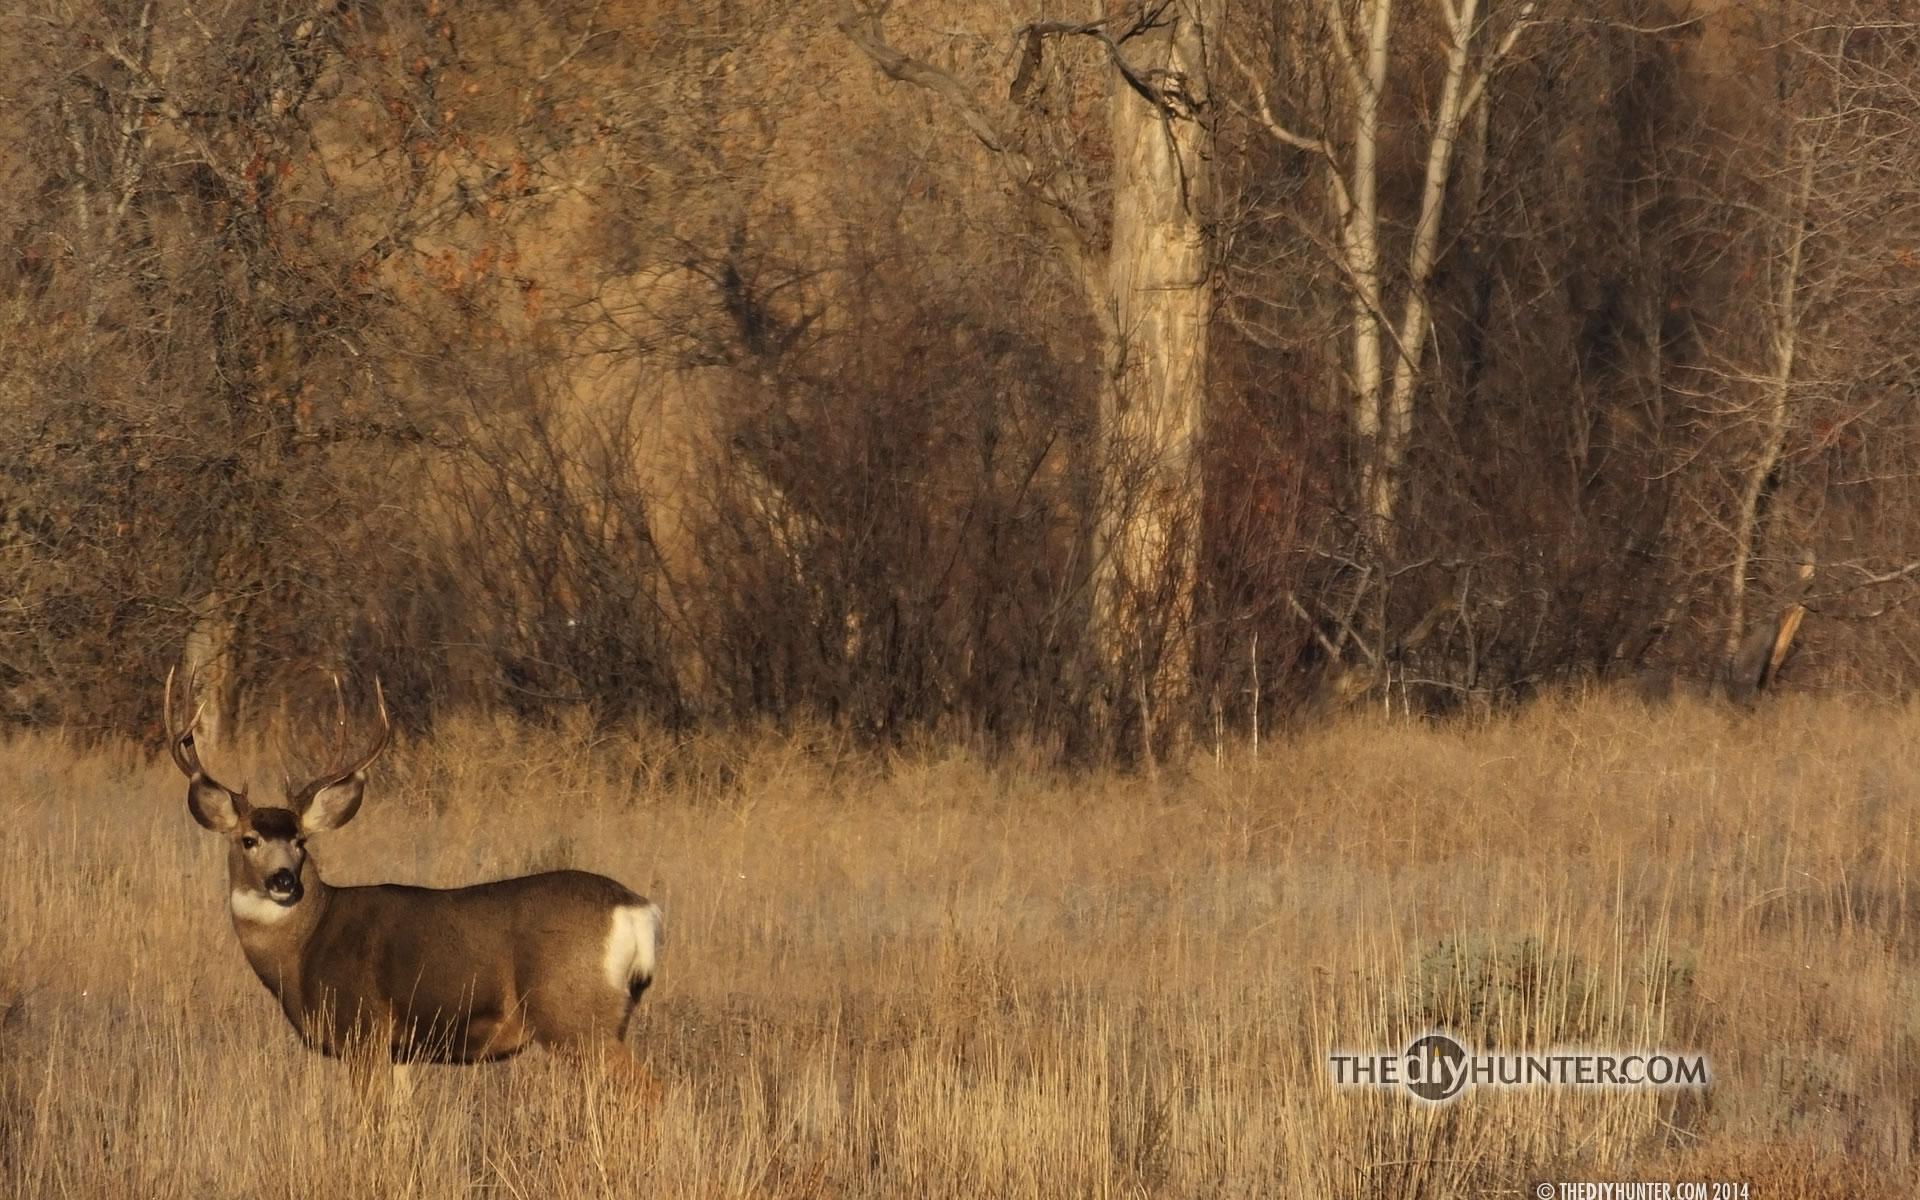 the diy hunter - the diy hunter's hunting desktop wallpapers